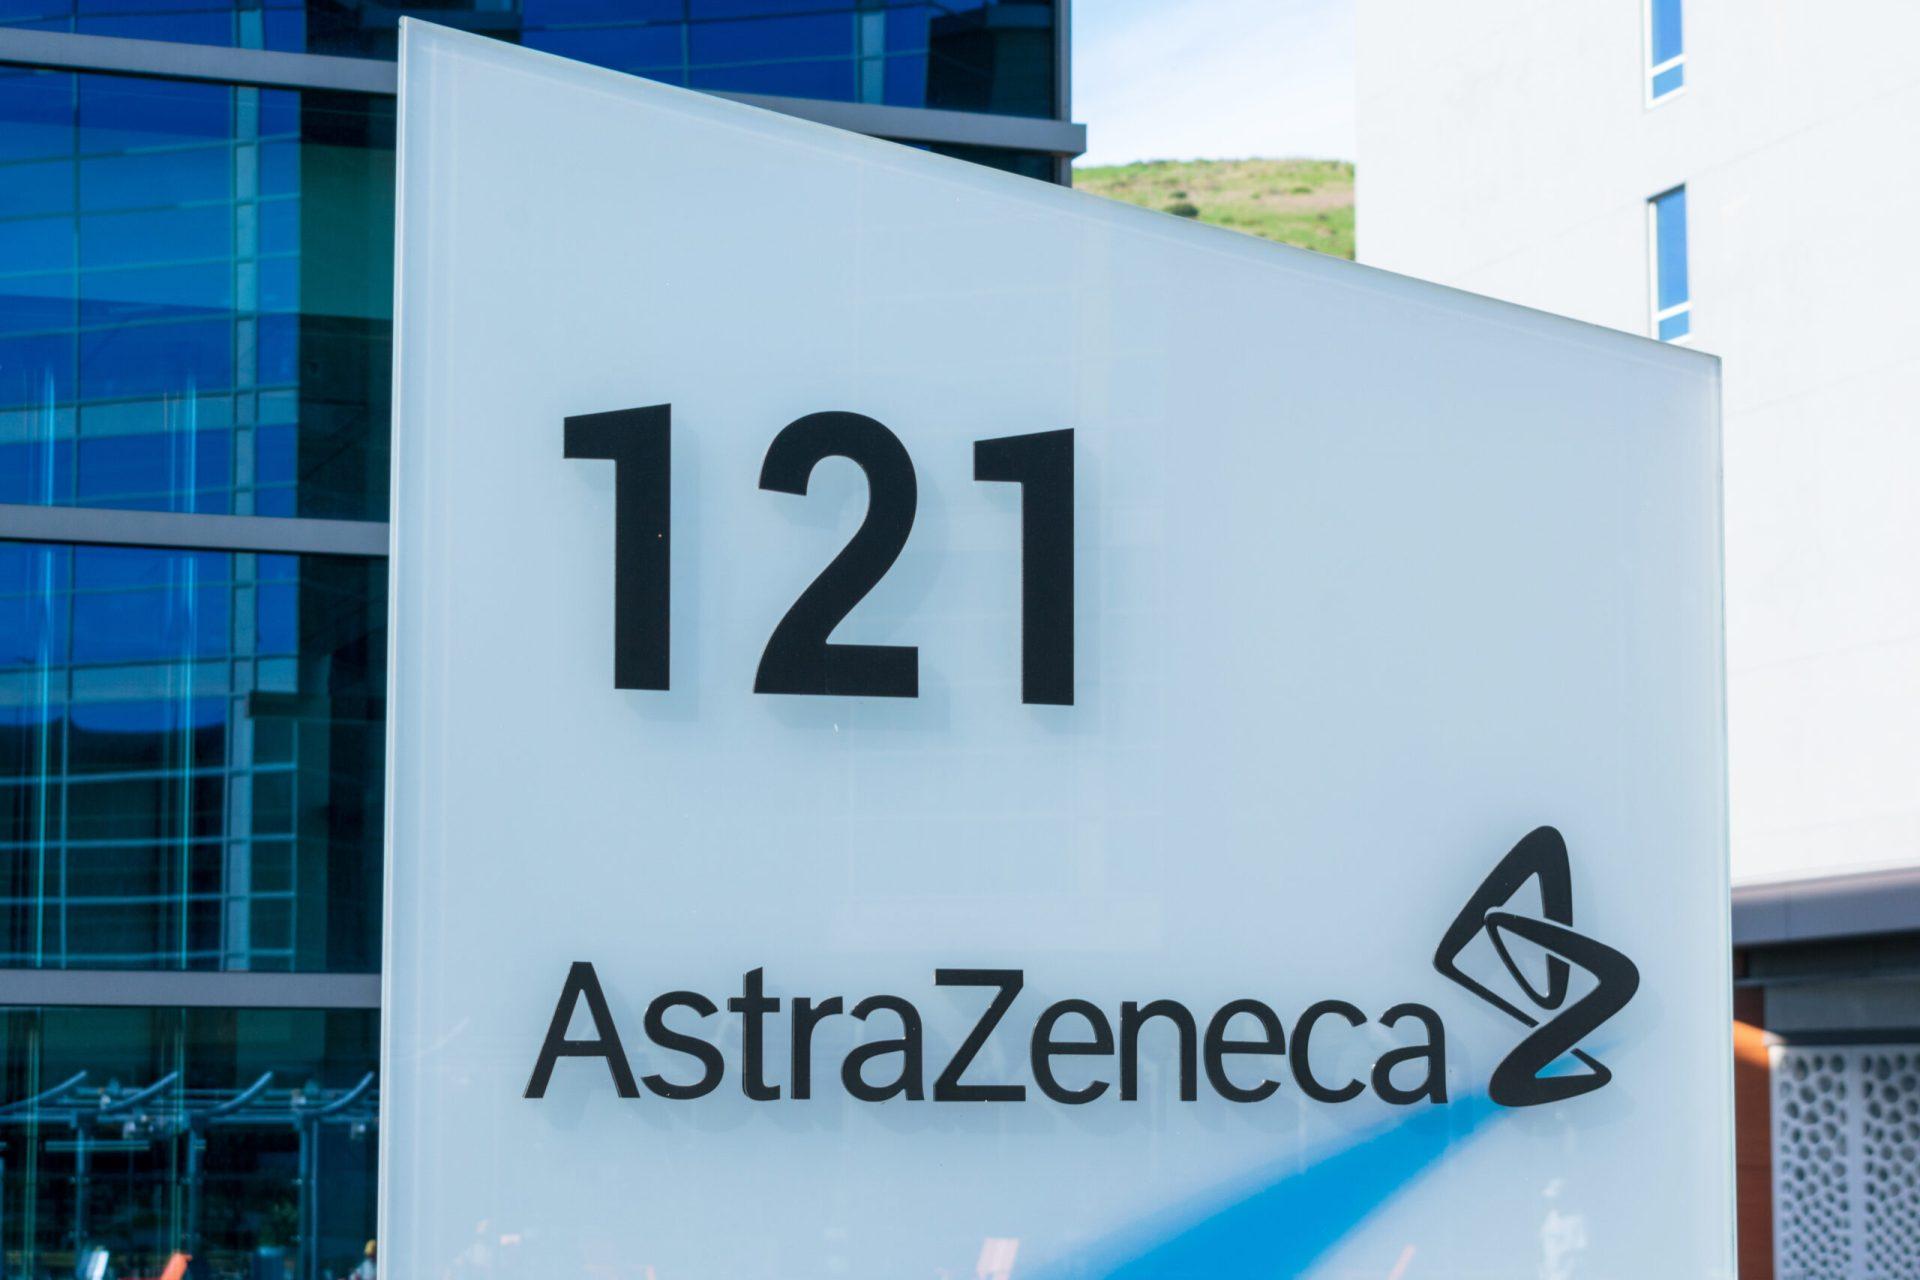 #FreeAstraZeneca